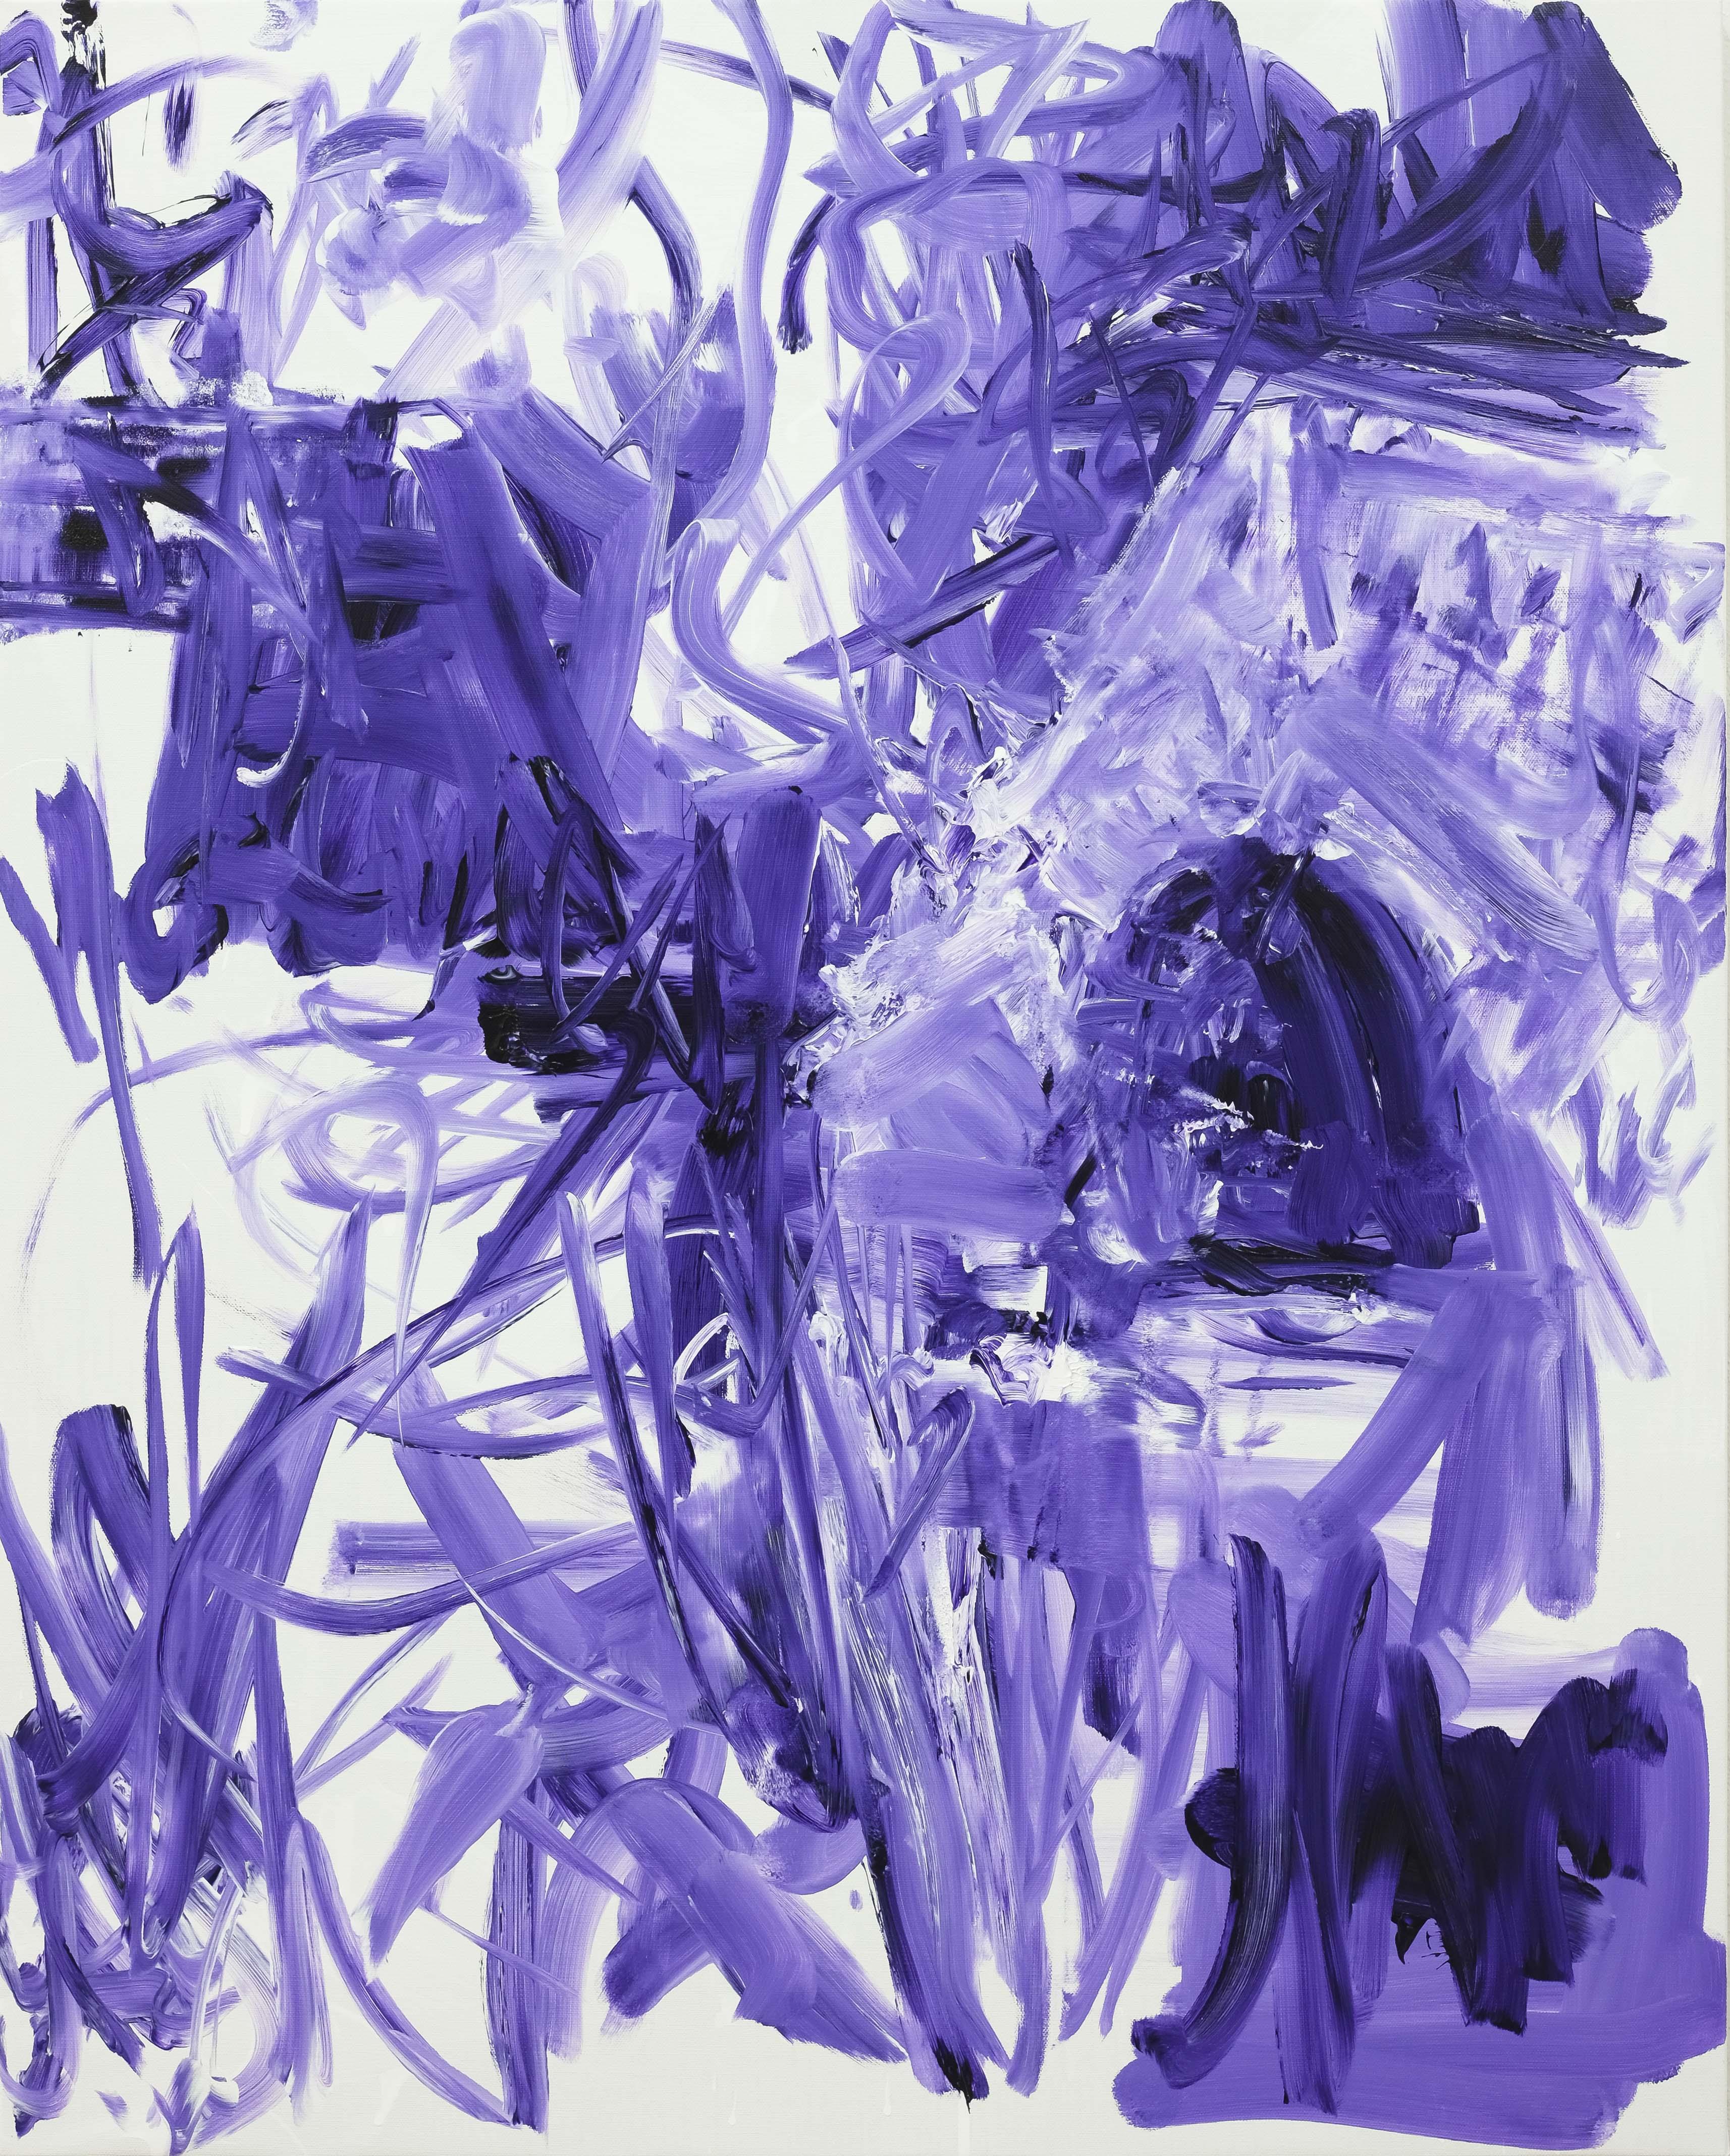 Untitled, 2016, acrylic on canvas, 100 x 80 cm